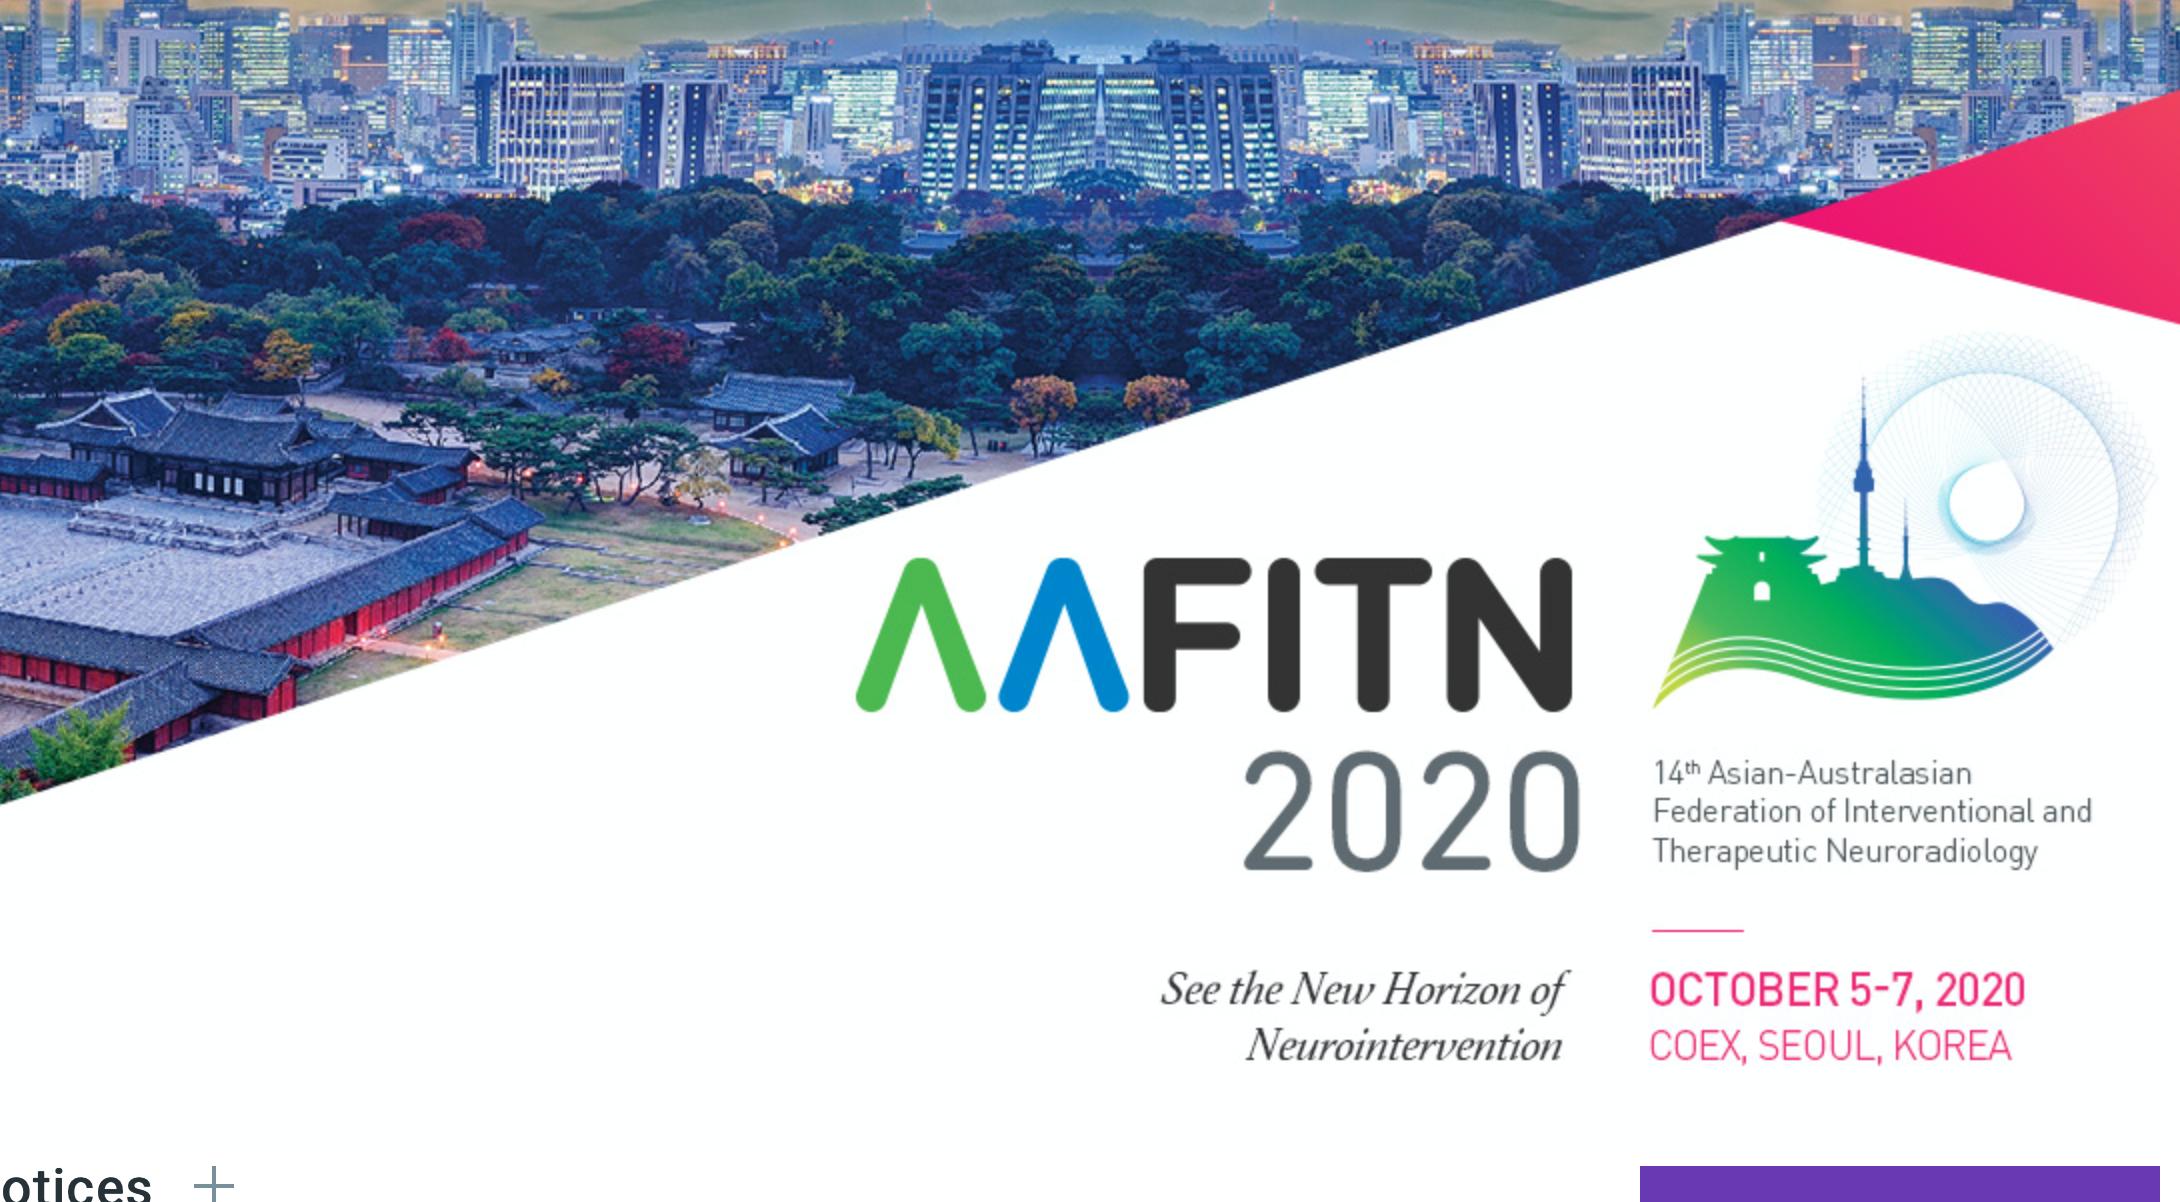 AAFITN 2020 in Korea